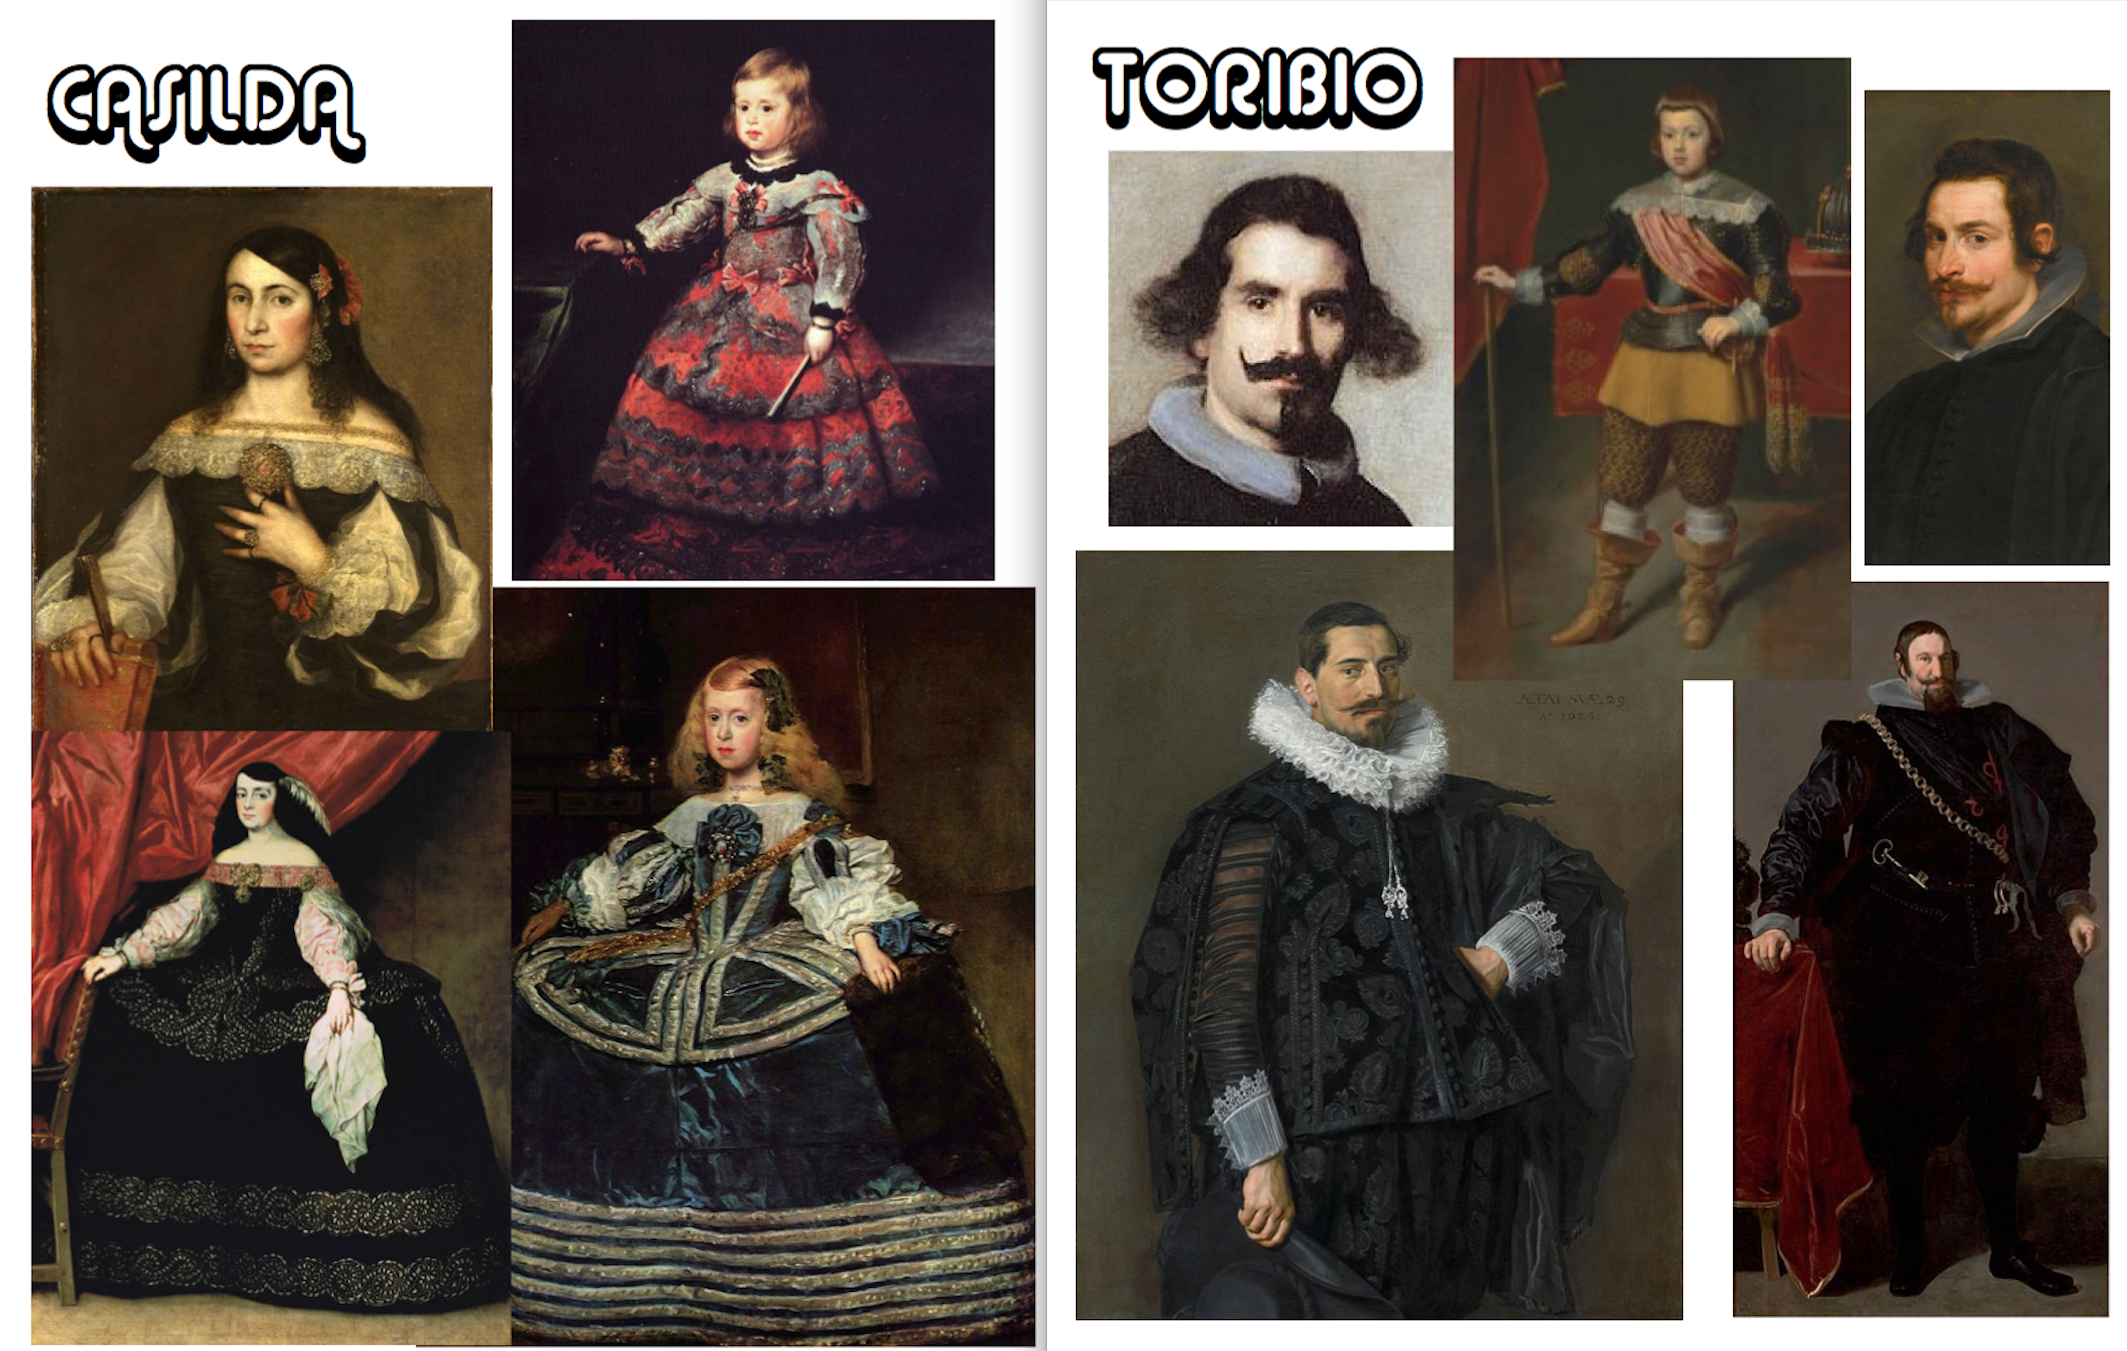 Concept, Casilda and Toribio.png